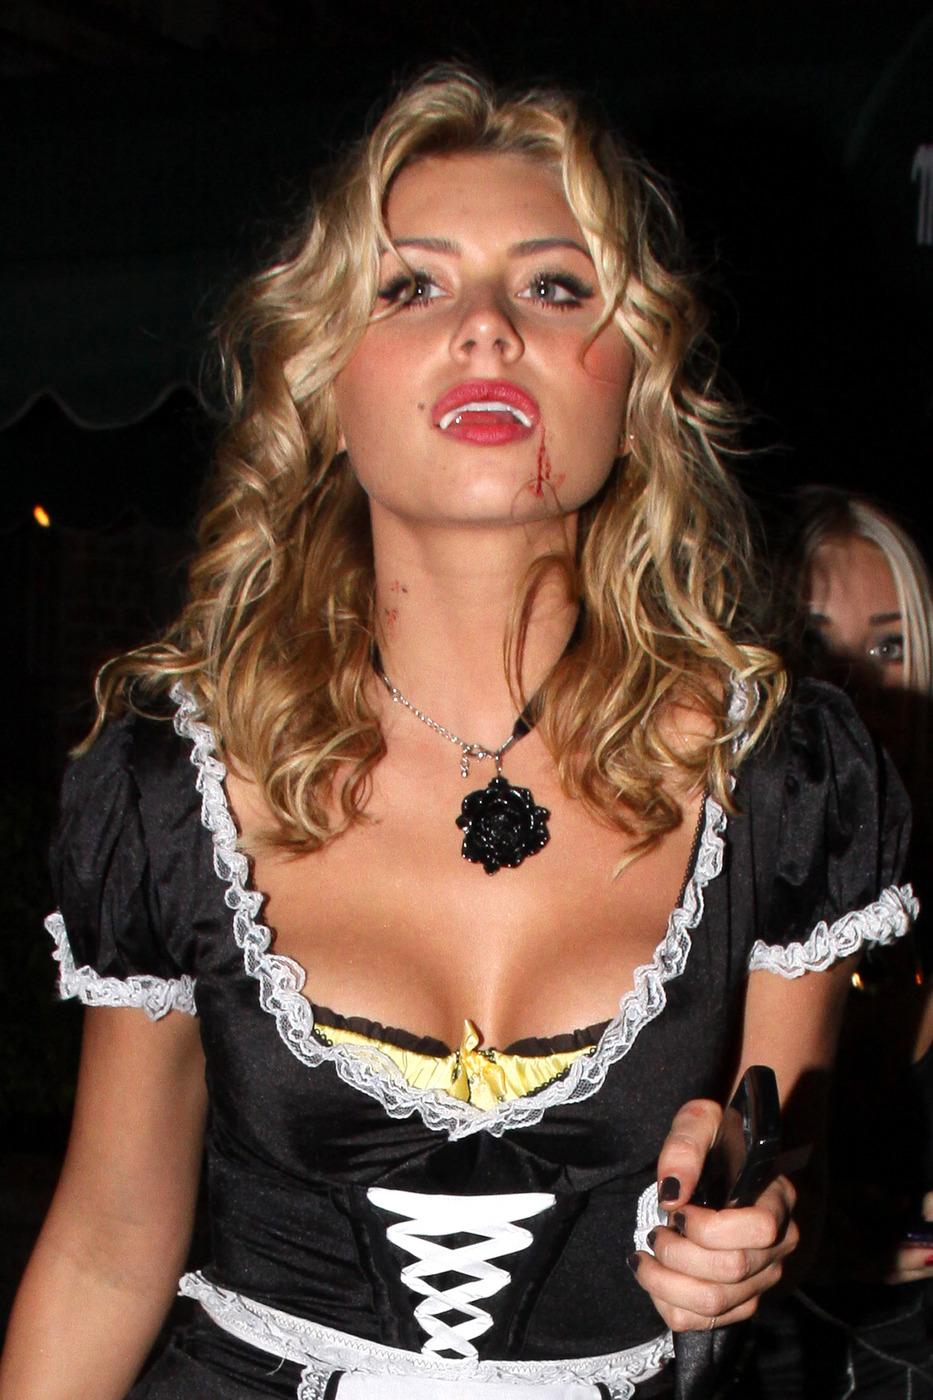 Alyson Michalka Desnuda wow!! aj michalka nudes exposed!